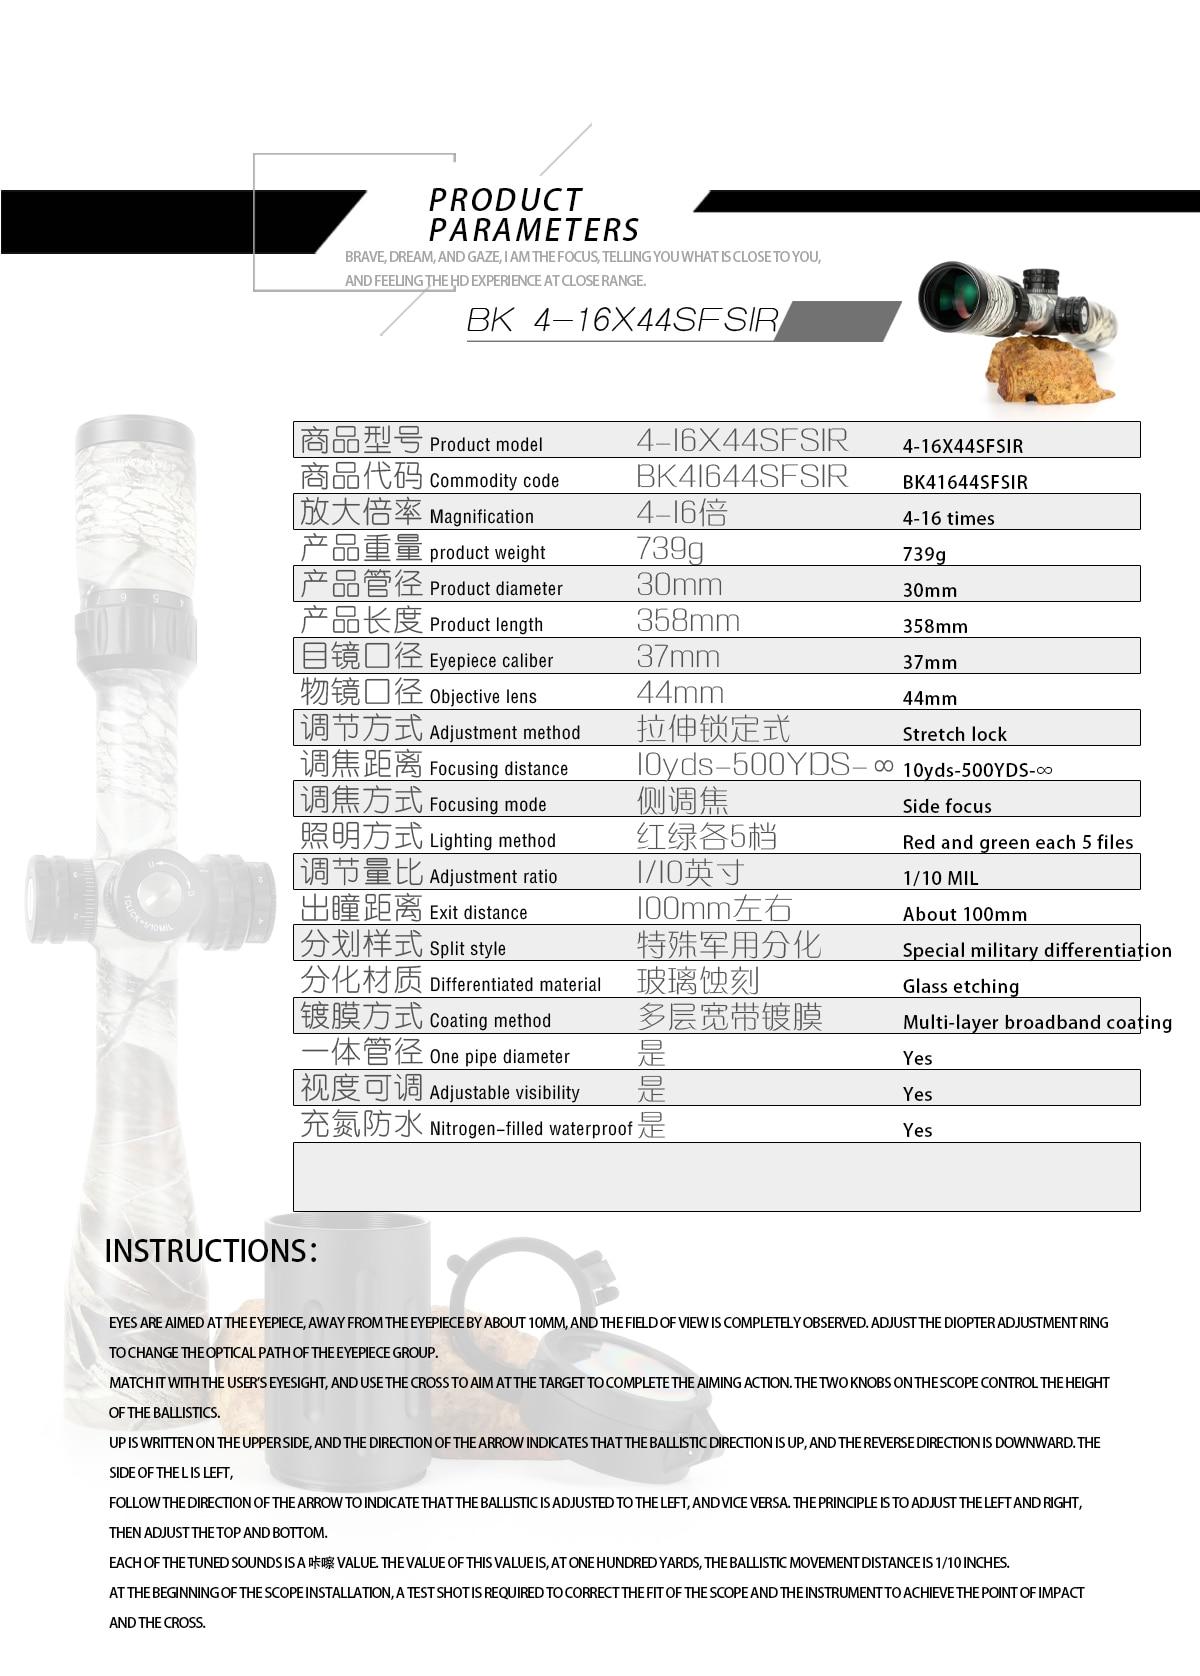 Bobcat rei 4-16x44 sfir riflescopes airsoft caça